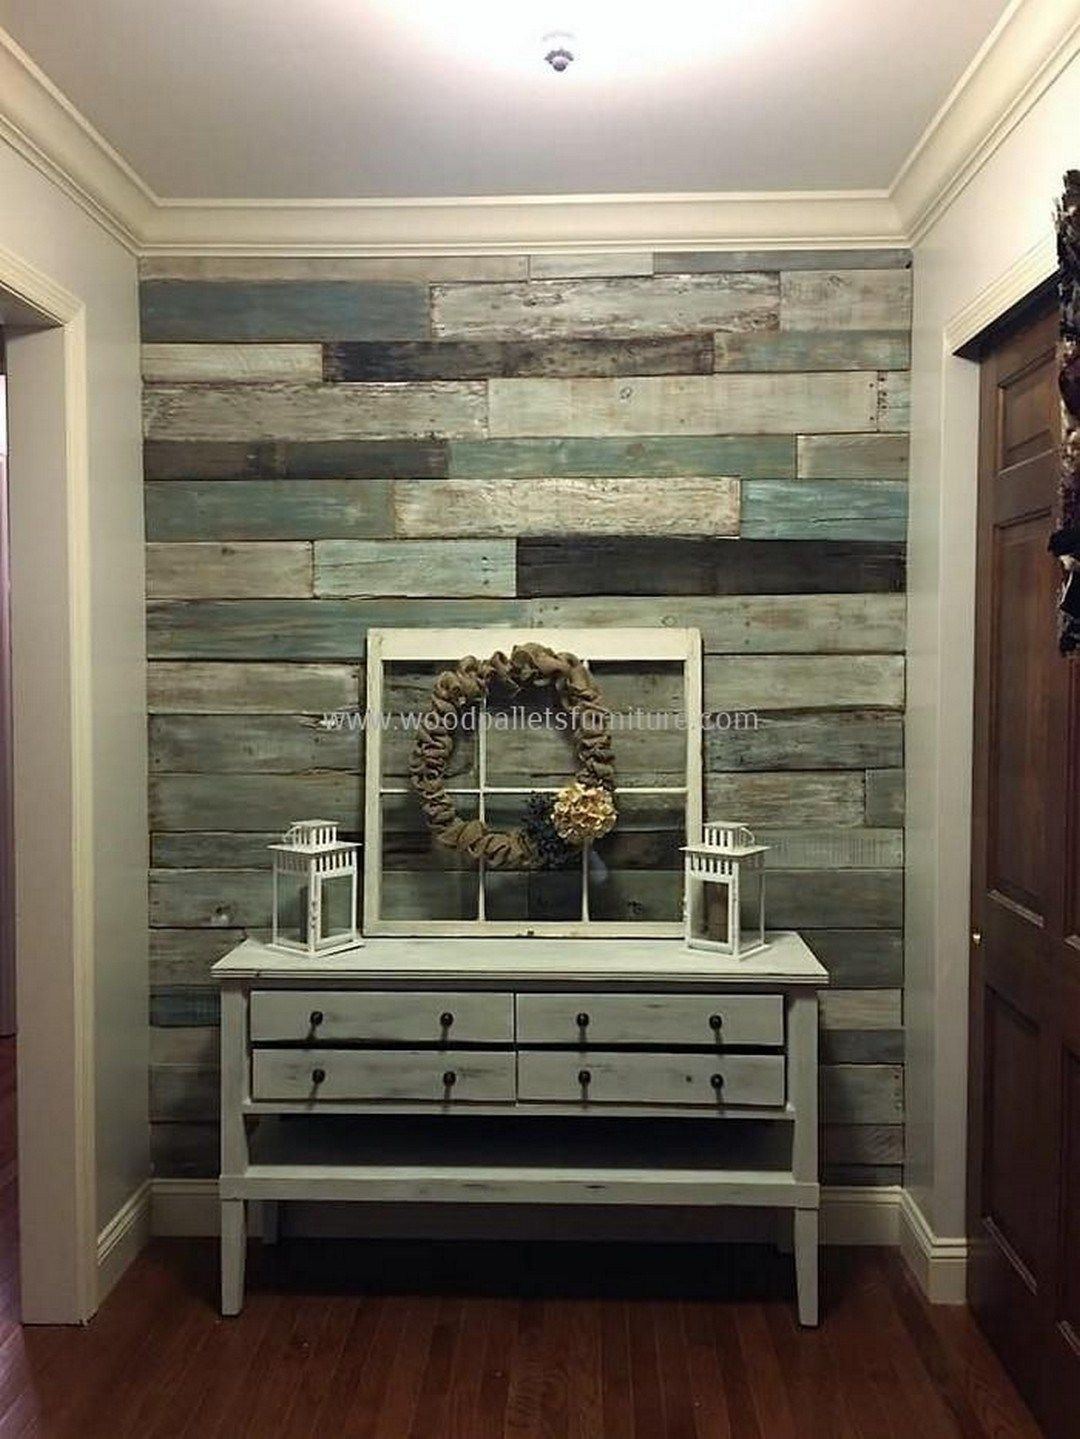 27 Tutes Tips Pallet Wood Wall Bathroom Wood Pallet Wall Art Wood Pallet Wall Unique Home Decor